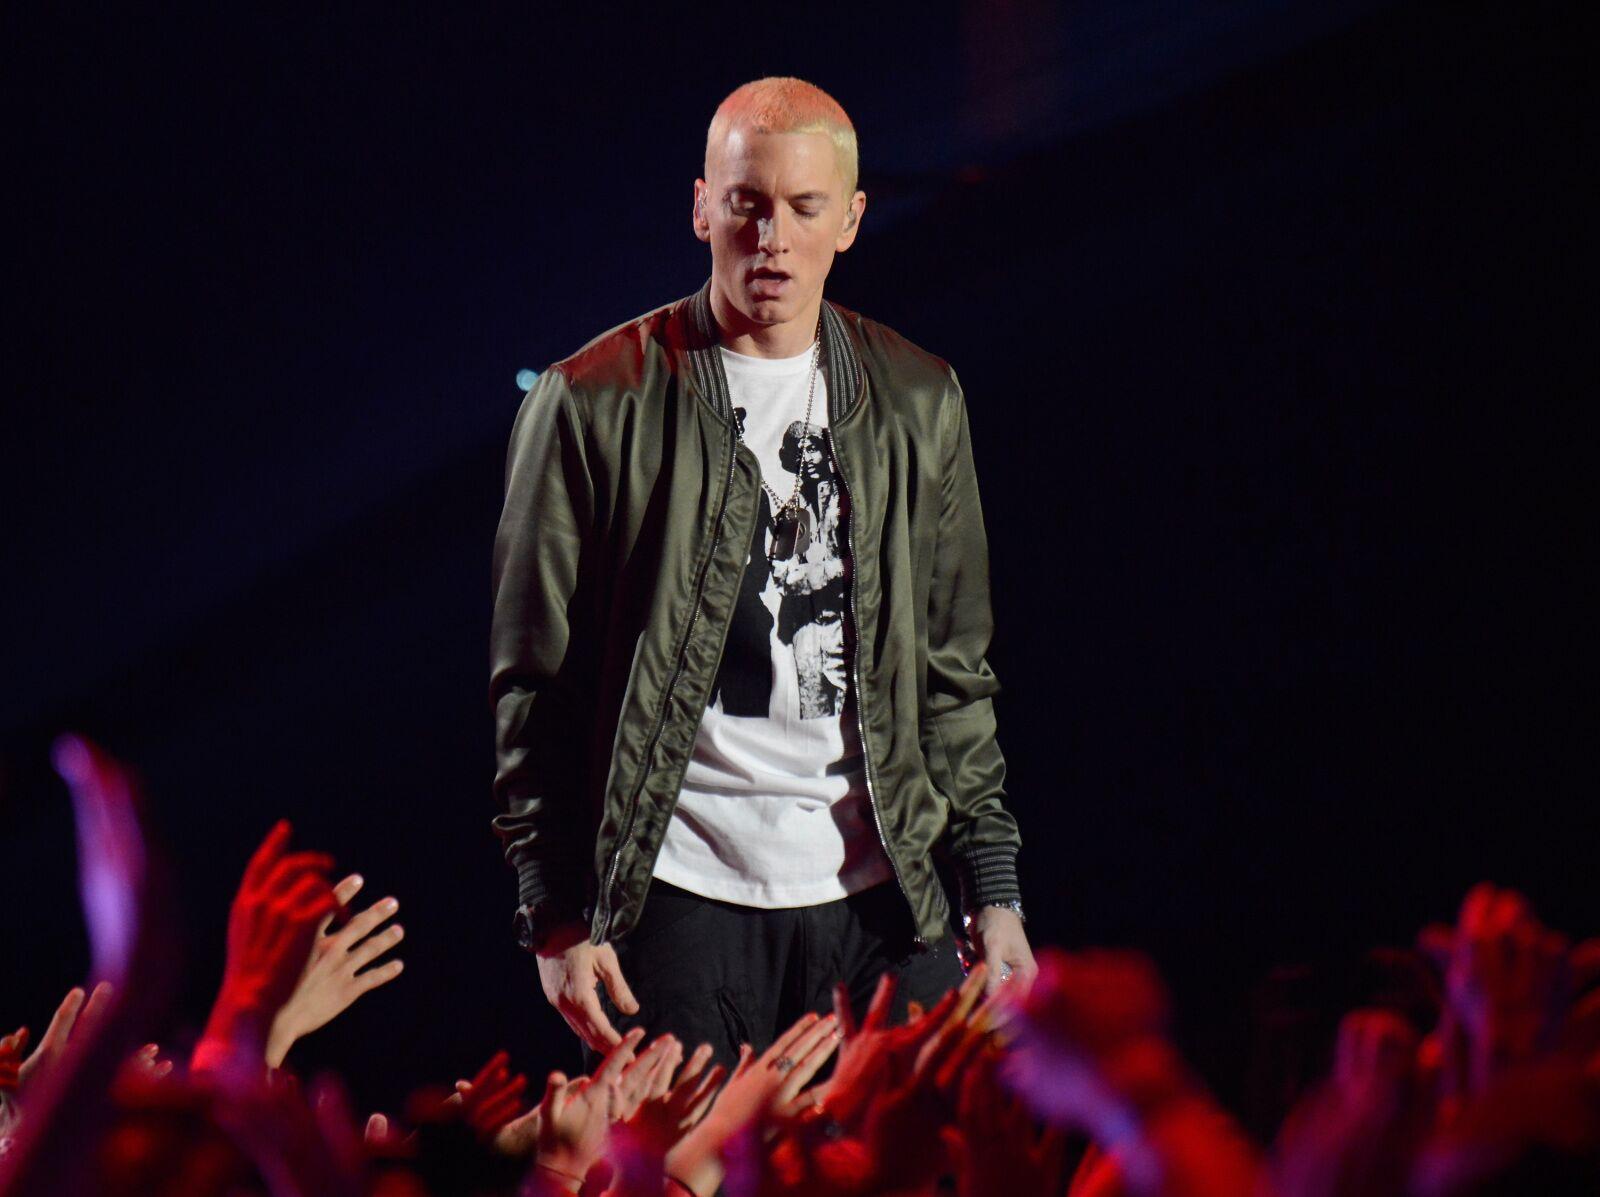 Report: WWE, Eminem agree to deal for 2K soundtrack, SmackDown appearance